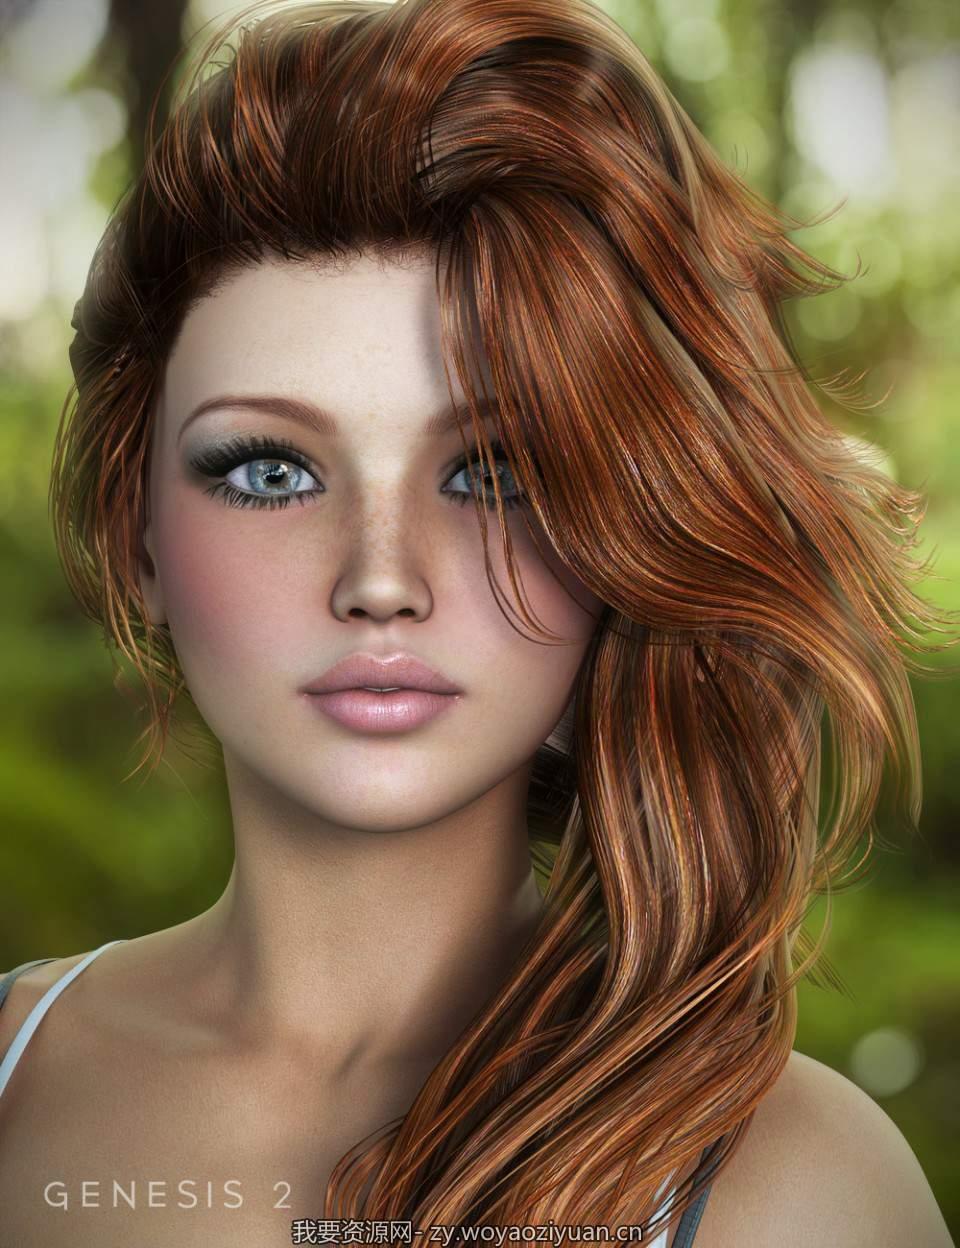 End of Summer Hair for Genesis and Genesis 2 Female(s)